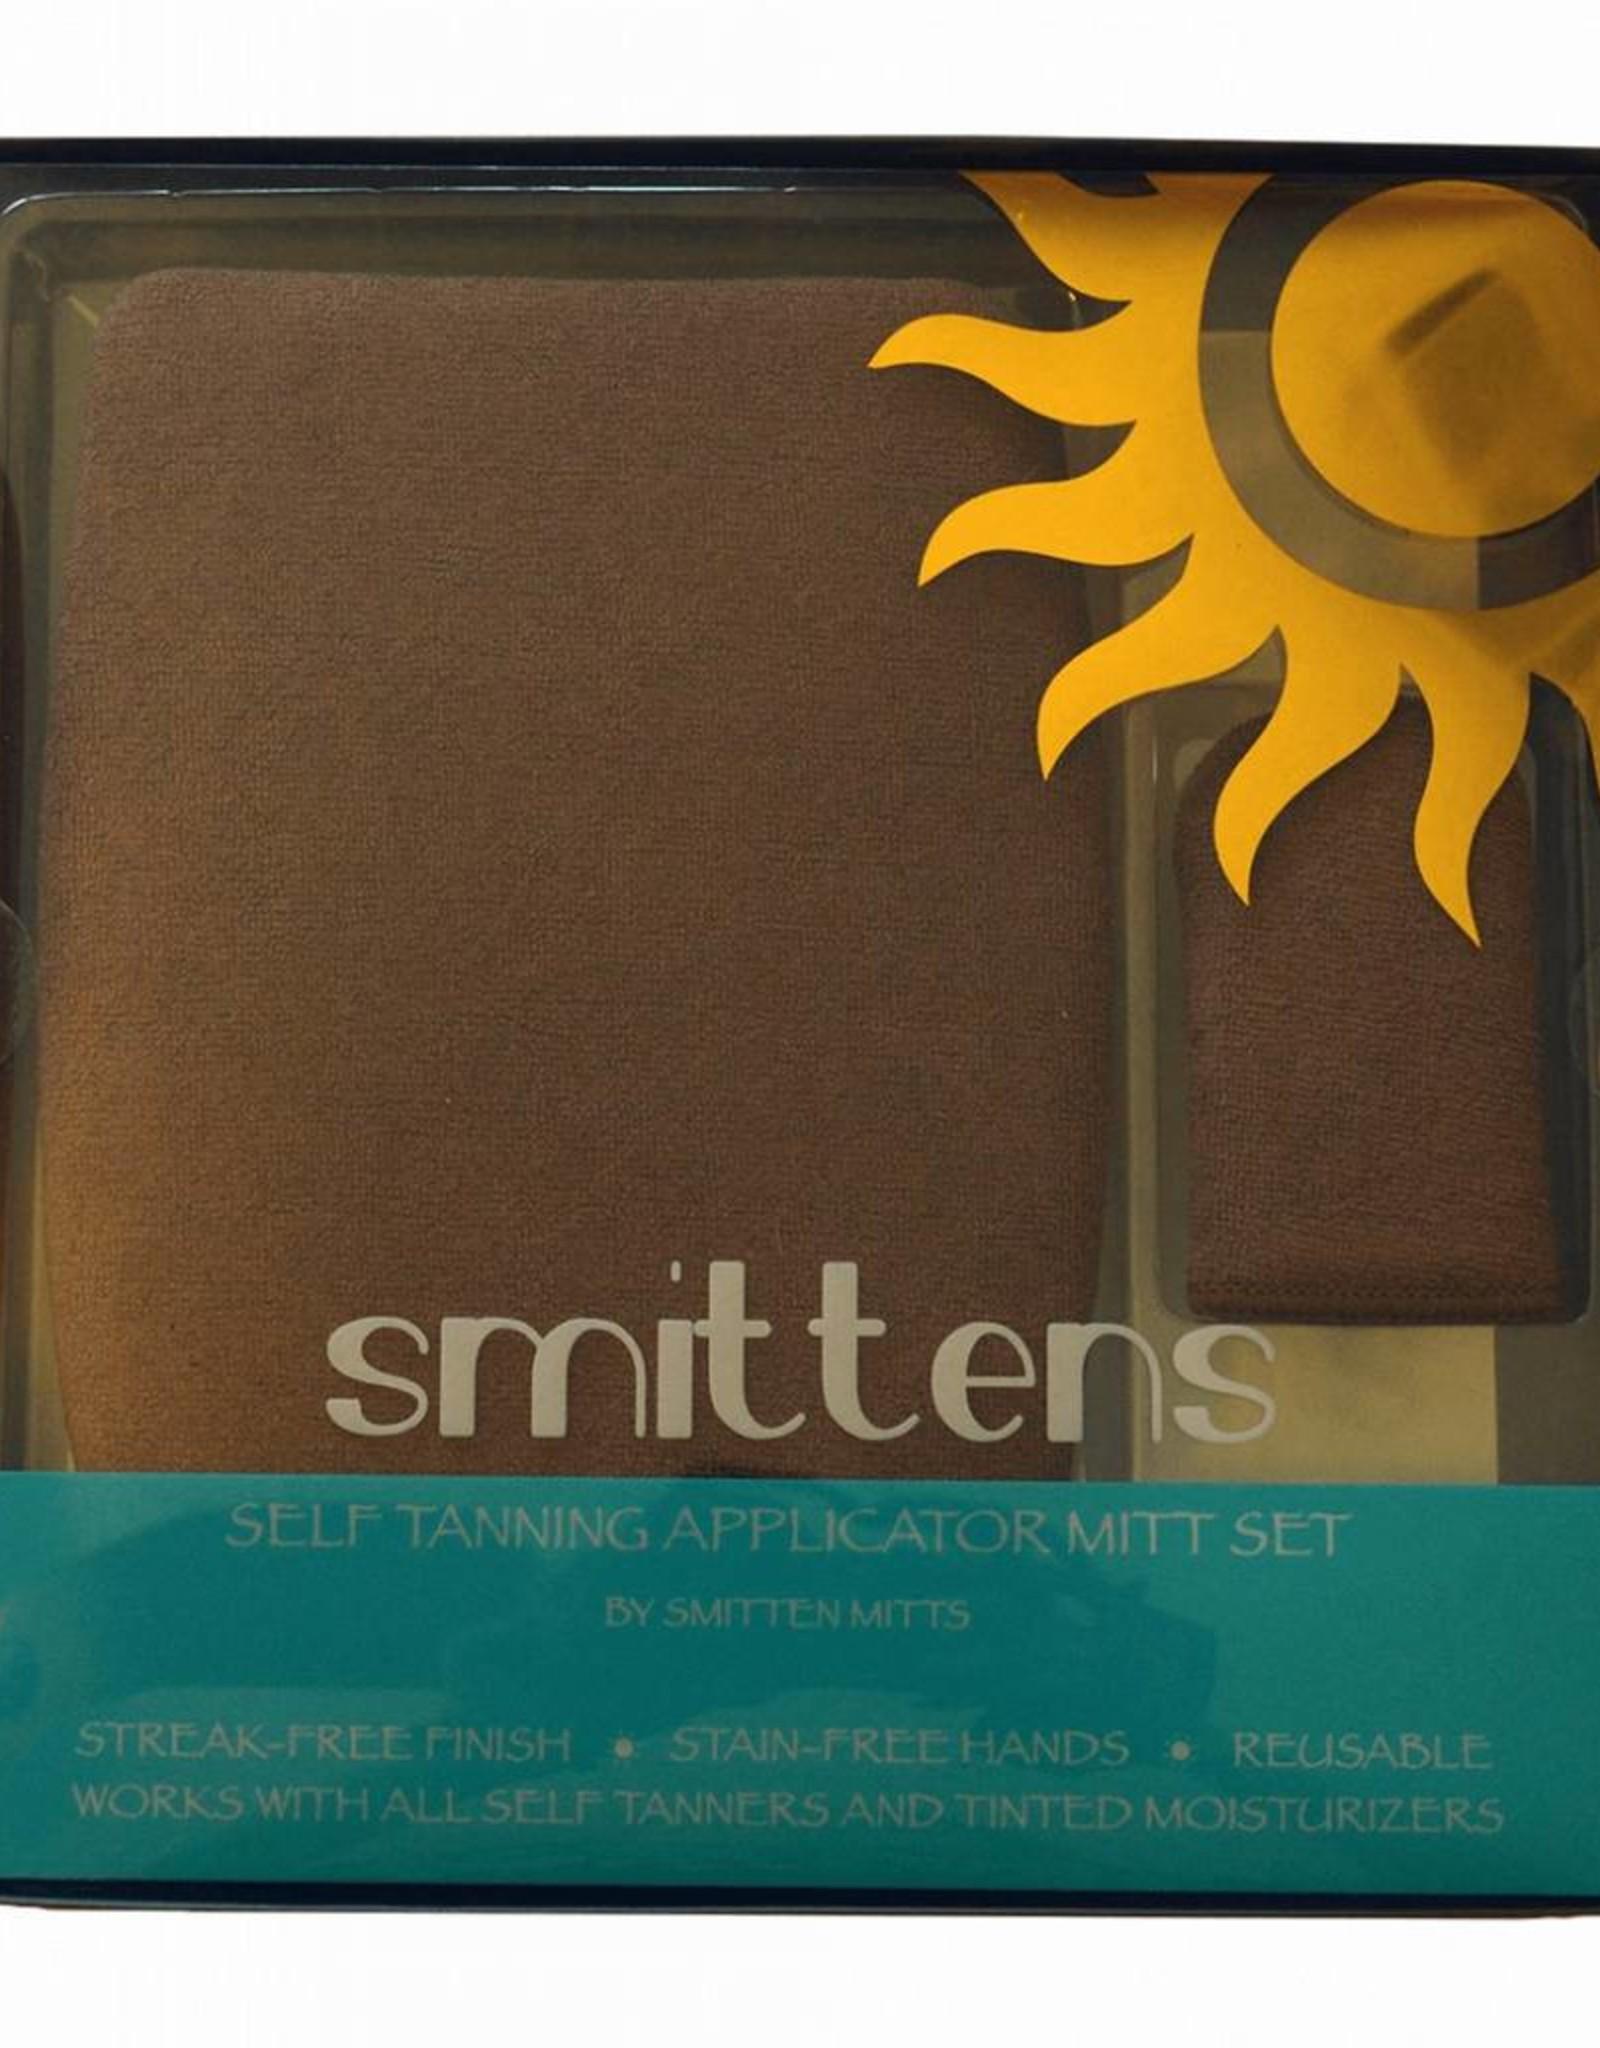 Smittens Selftan handschoen cadeau verpakking